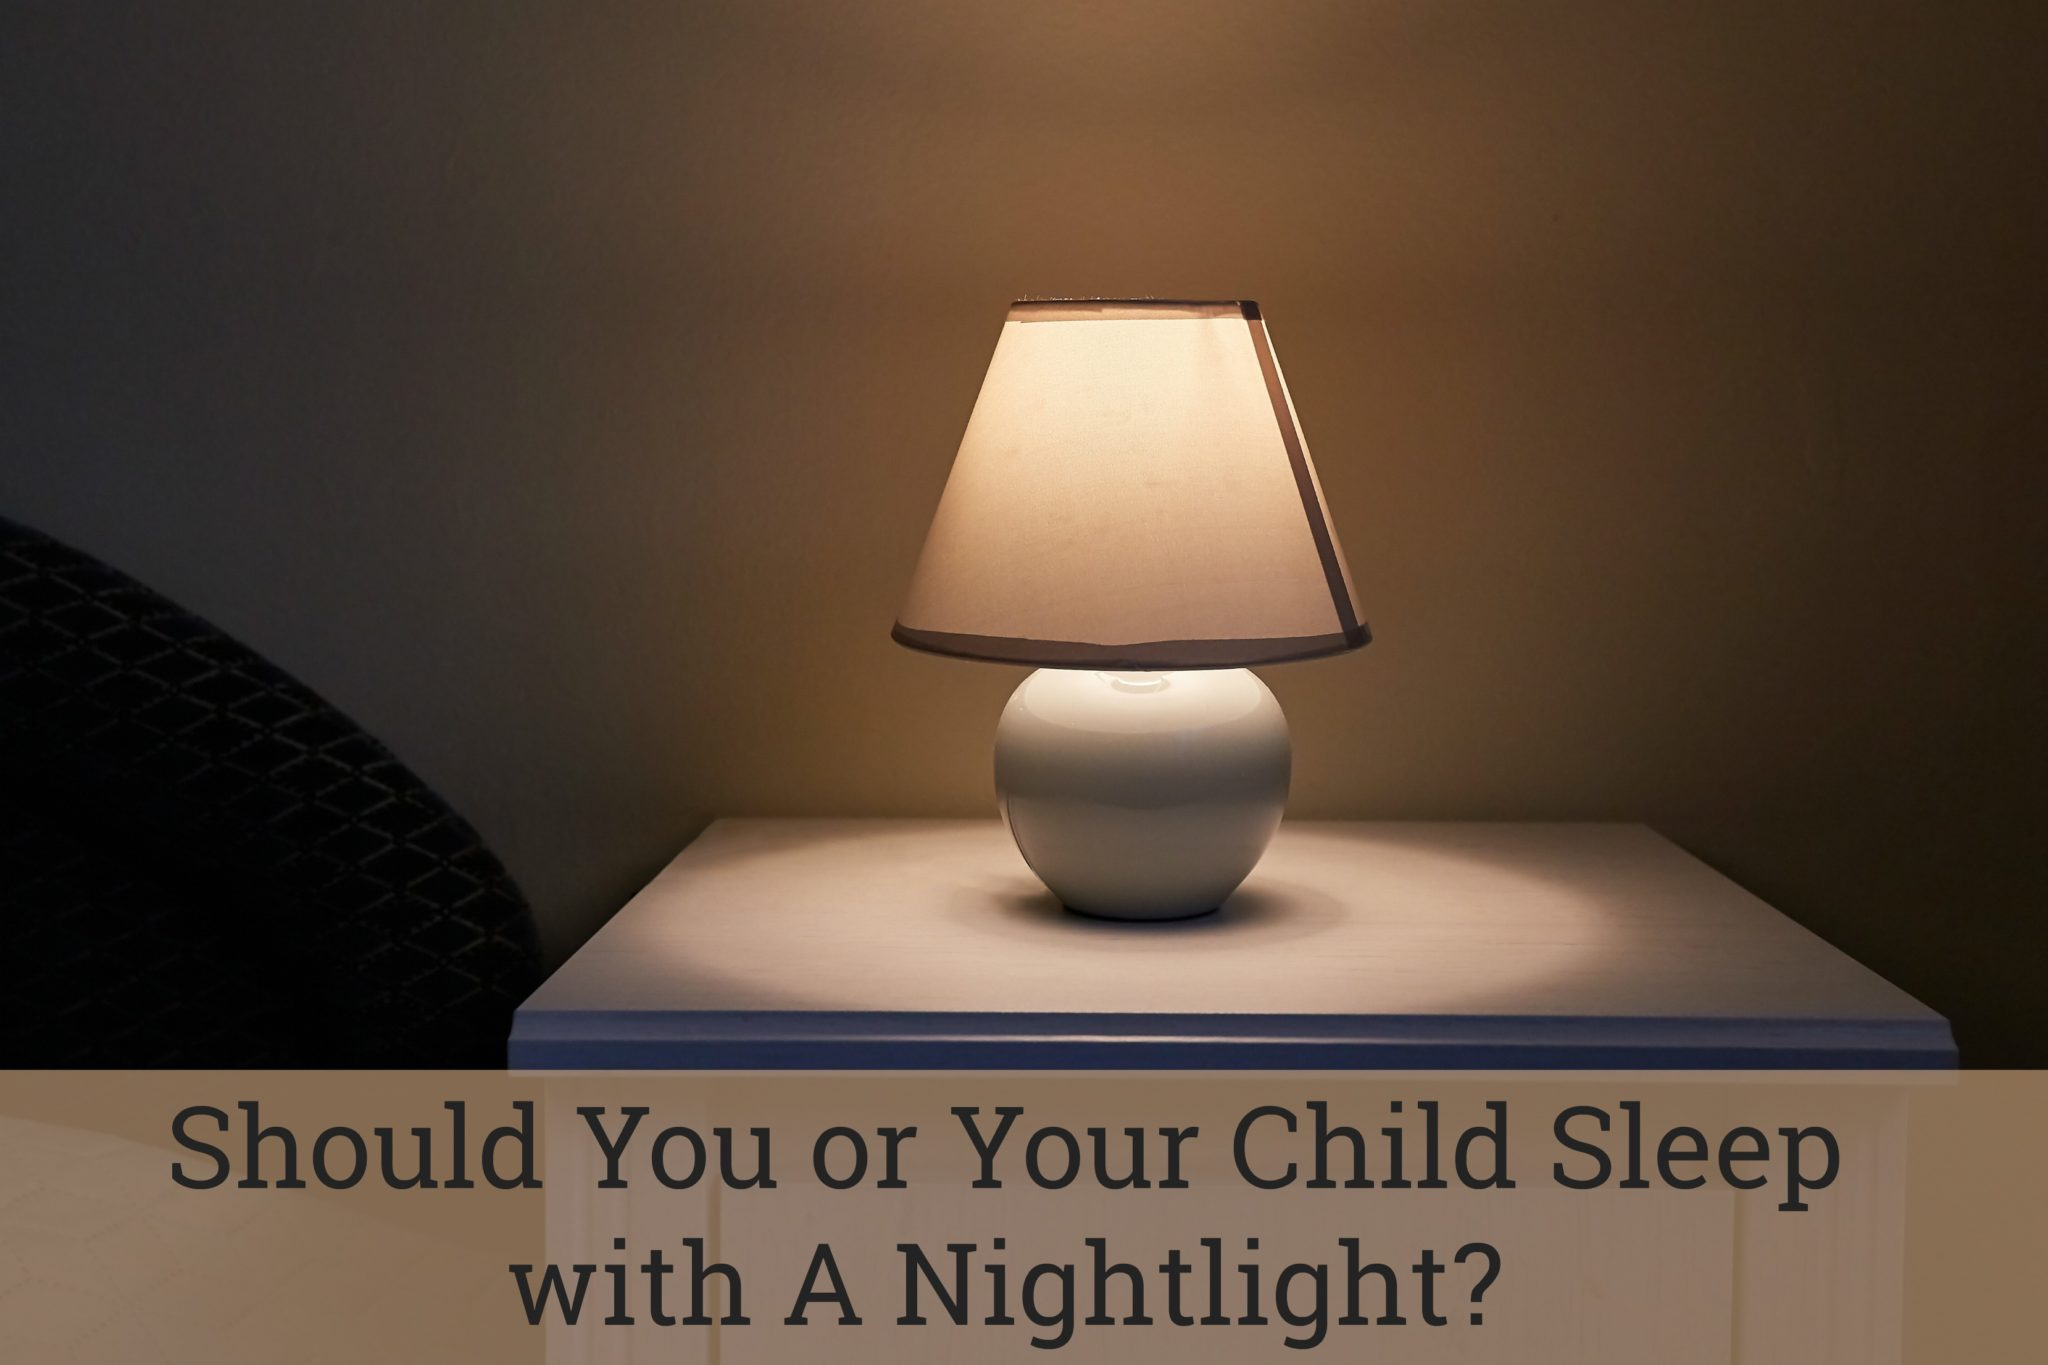 should you sleep with a nightlight?